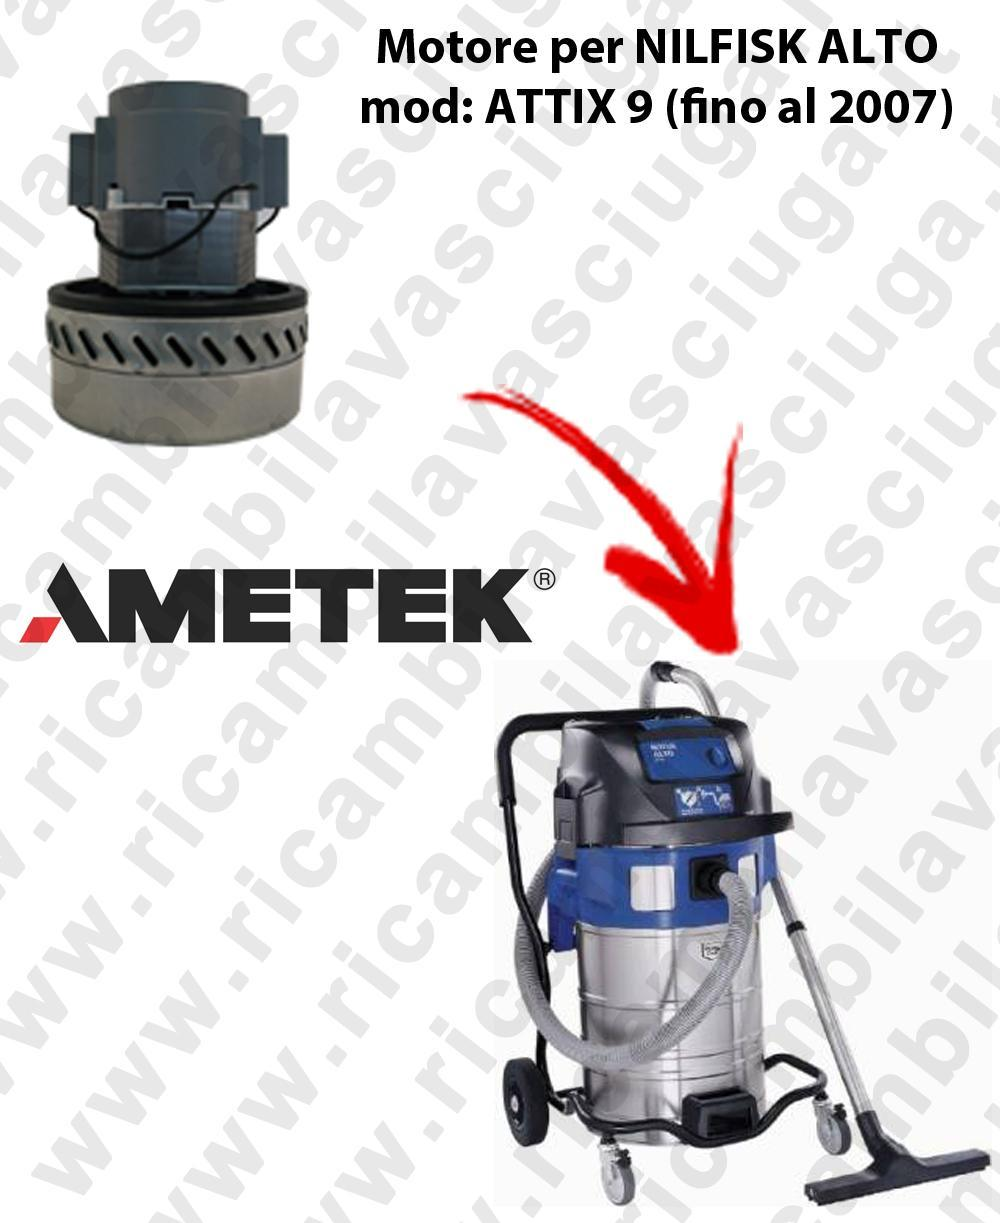 ATTIX 9 (tilll 2007) Ametek Vacuum Motor for vacuum cleaner NILFISK ALTO